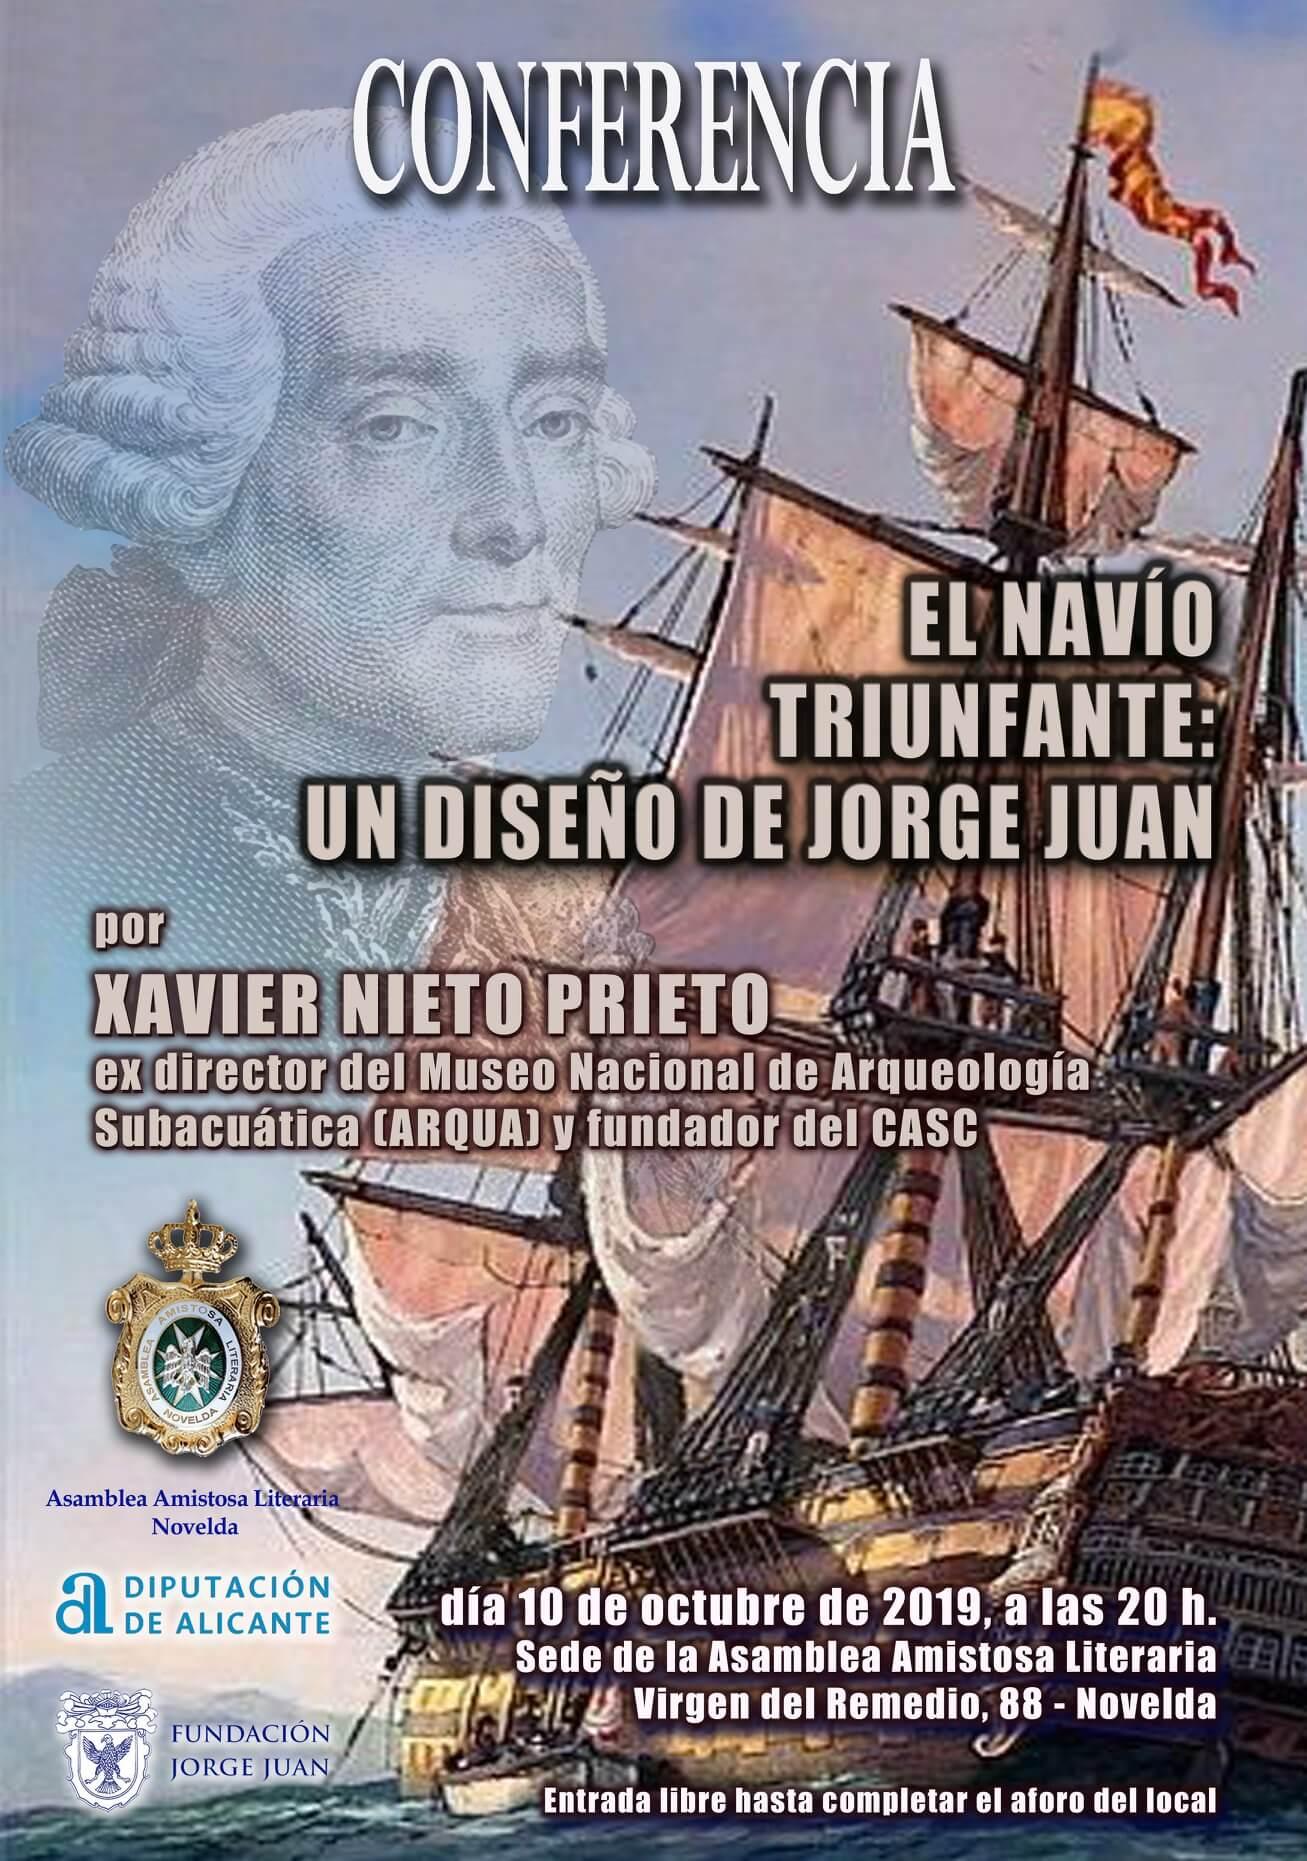 El navío Triunfante: un diseño de Jorge Juan